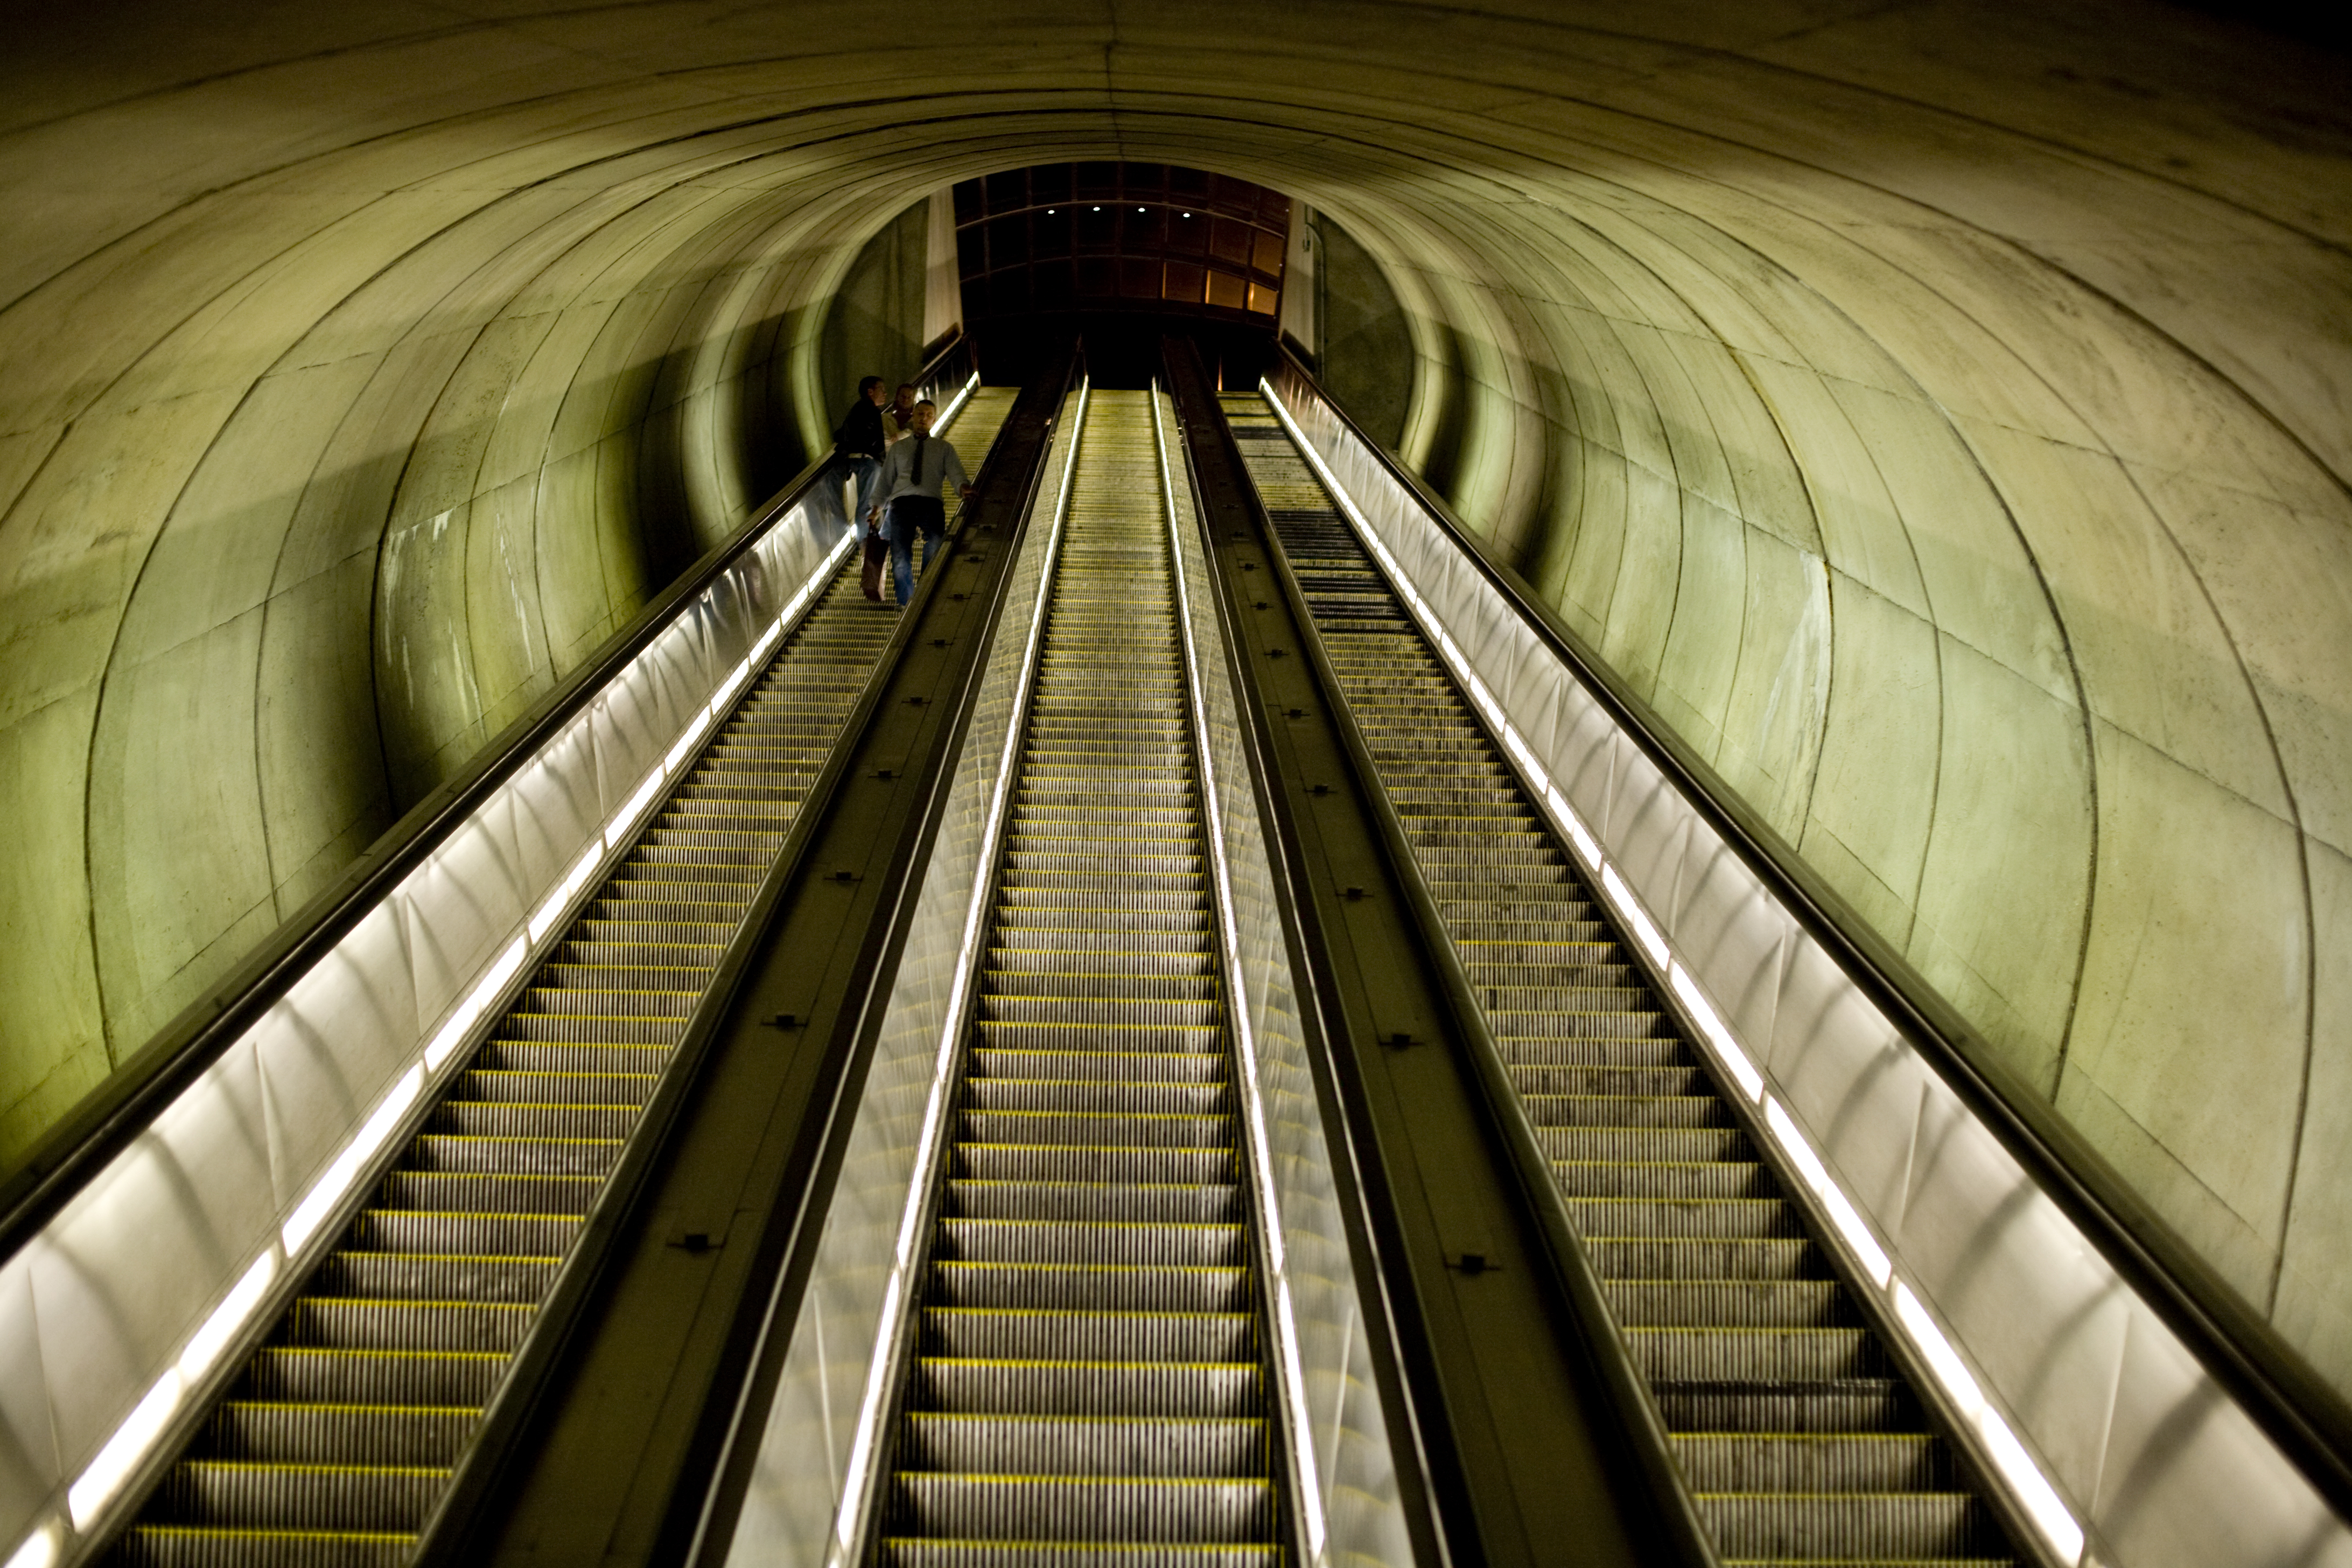 filemetro escalators dupont circlejpg wikimedia commons